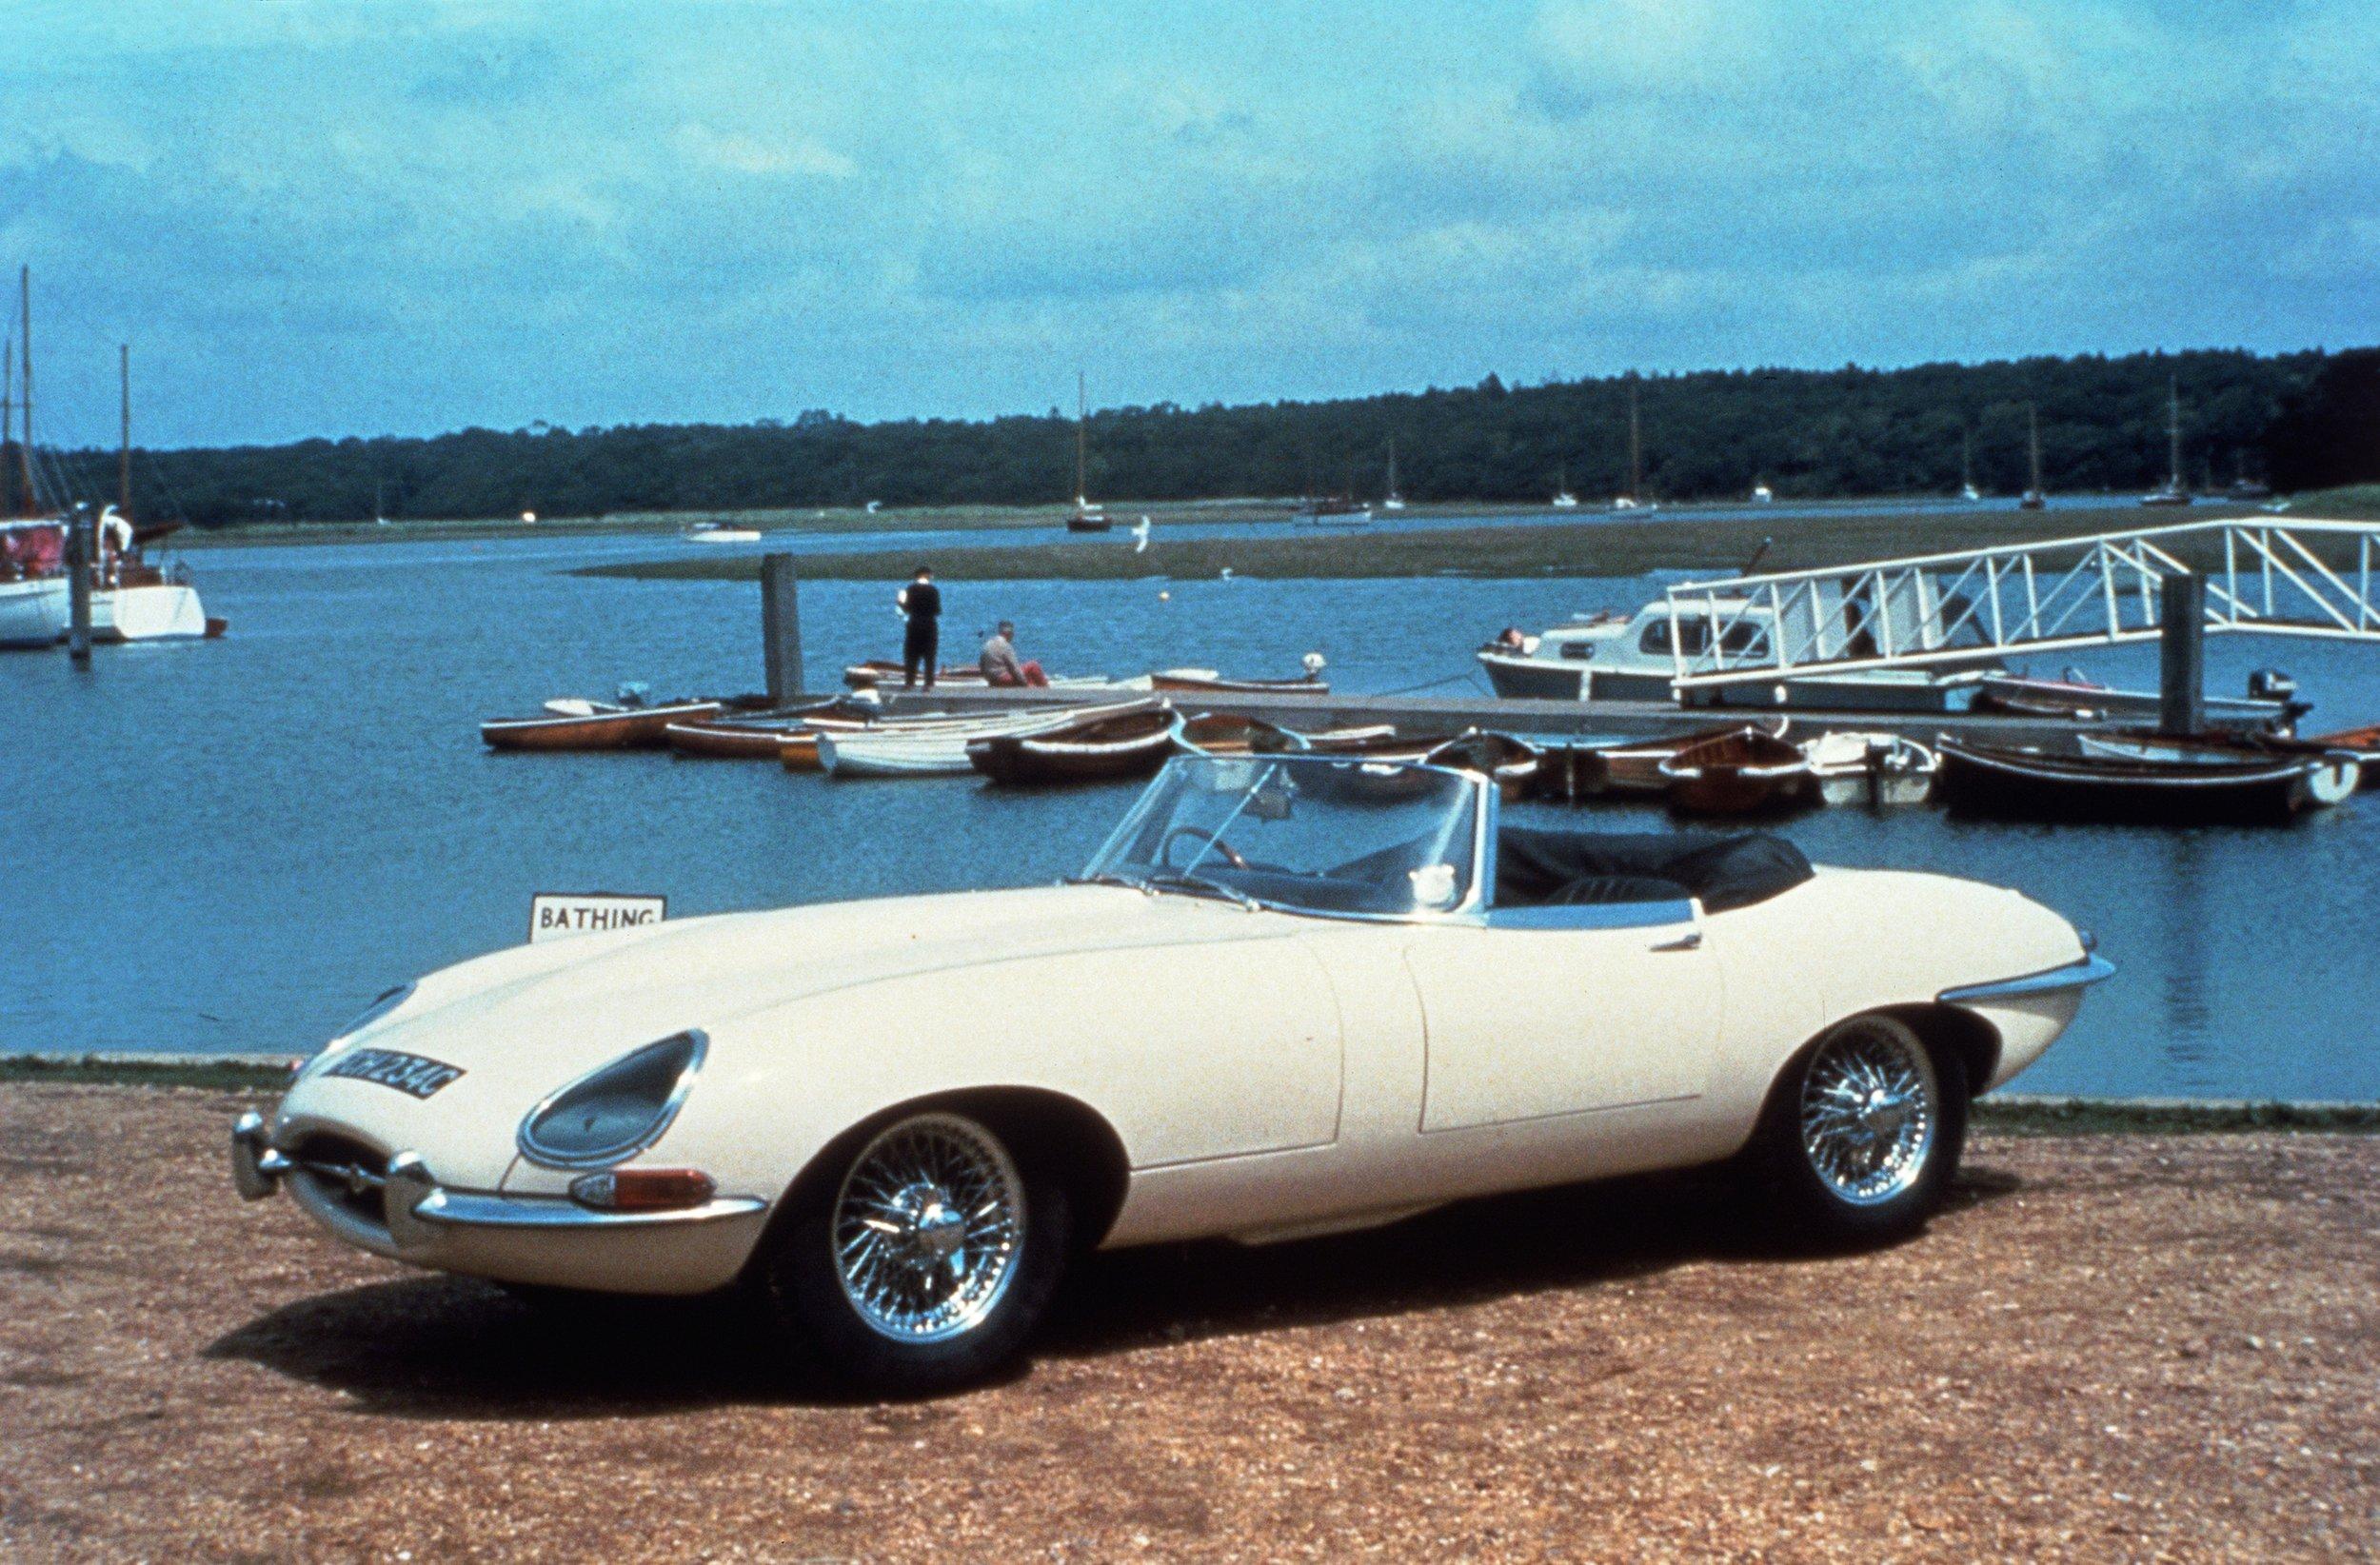 008 1964 E-type.jpg